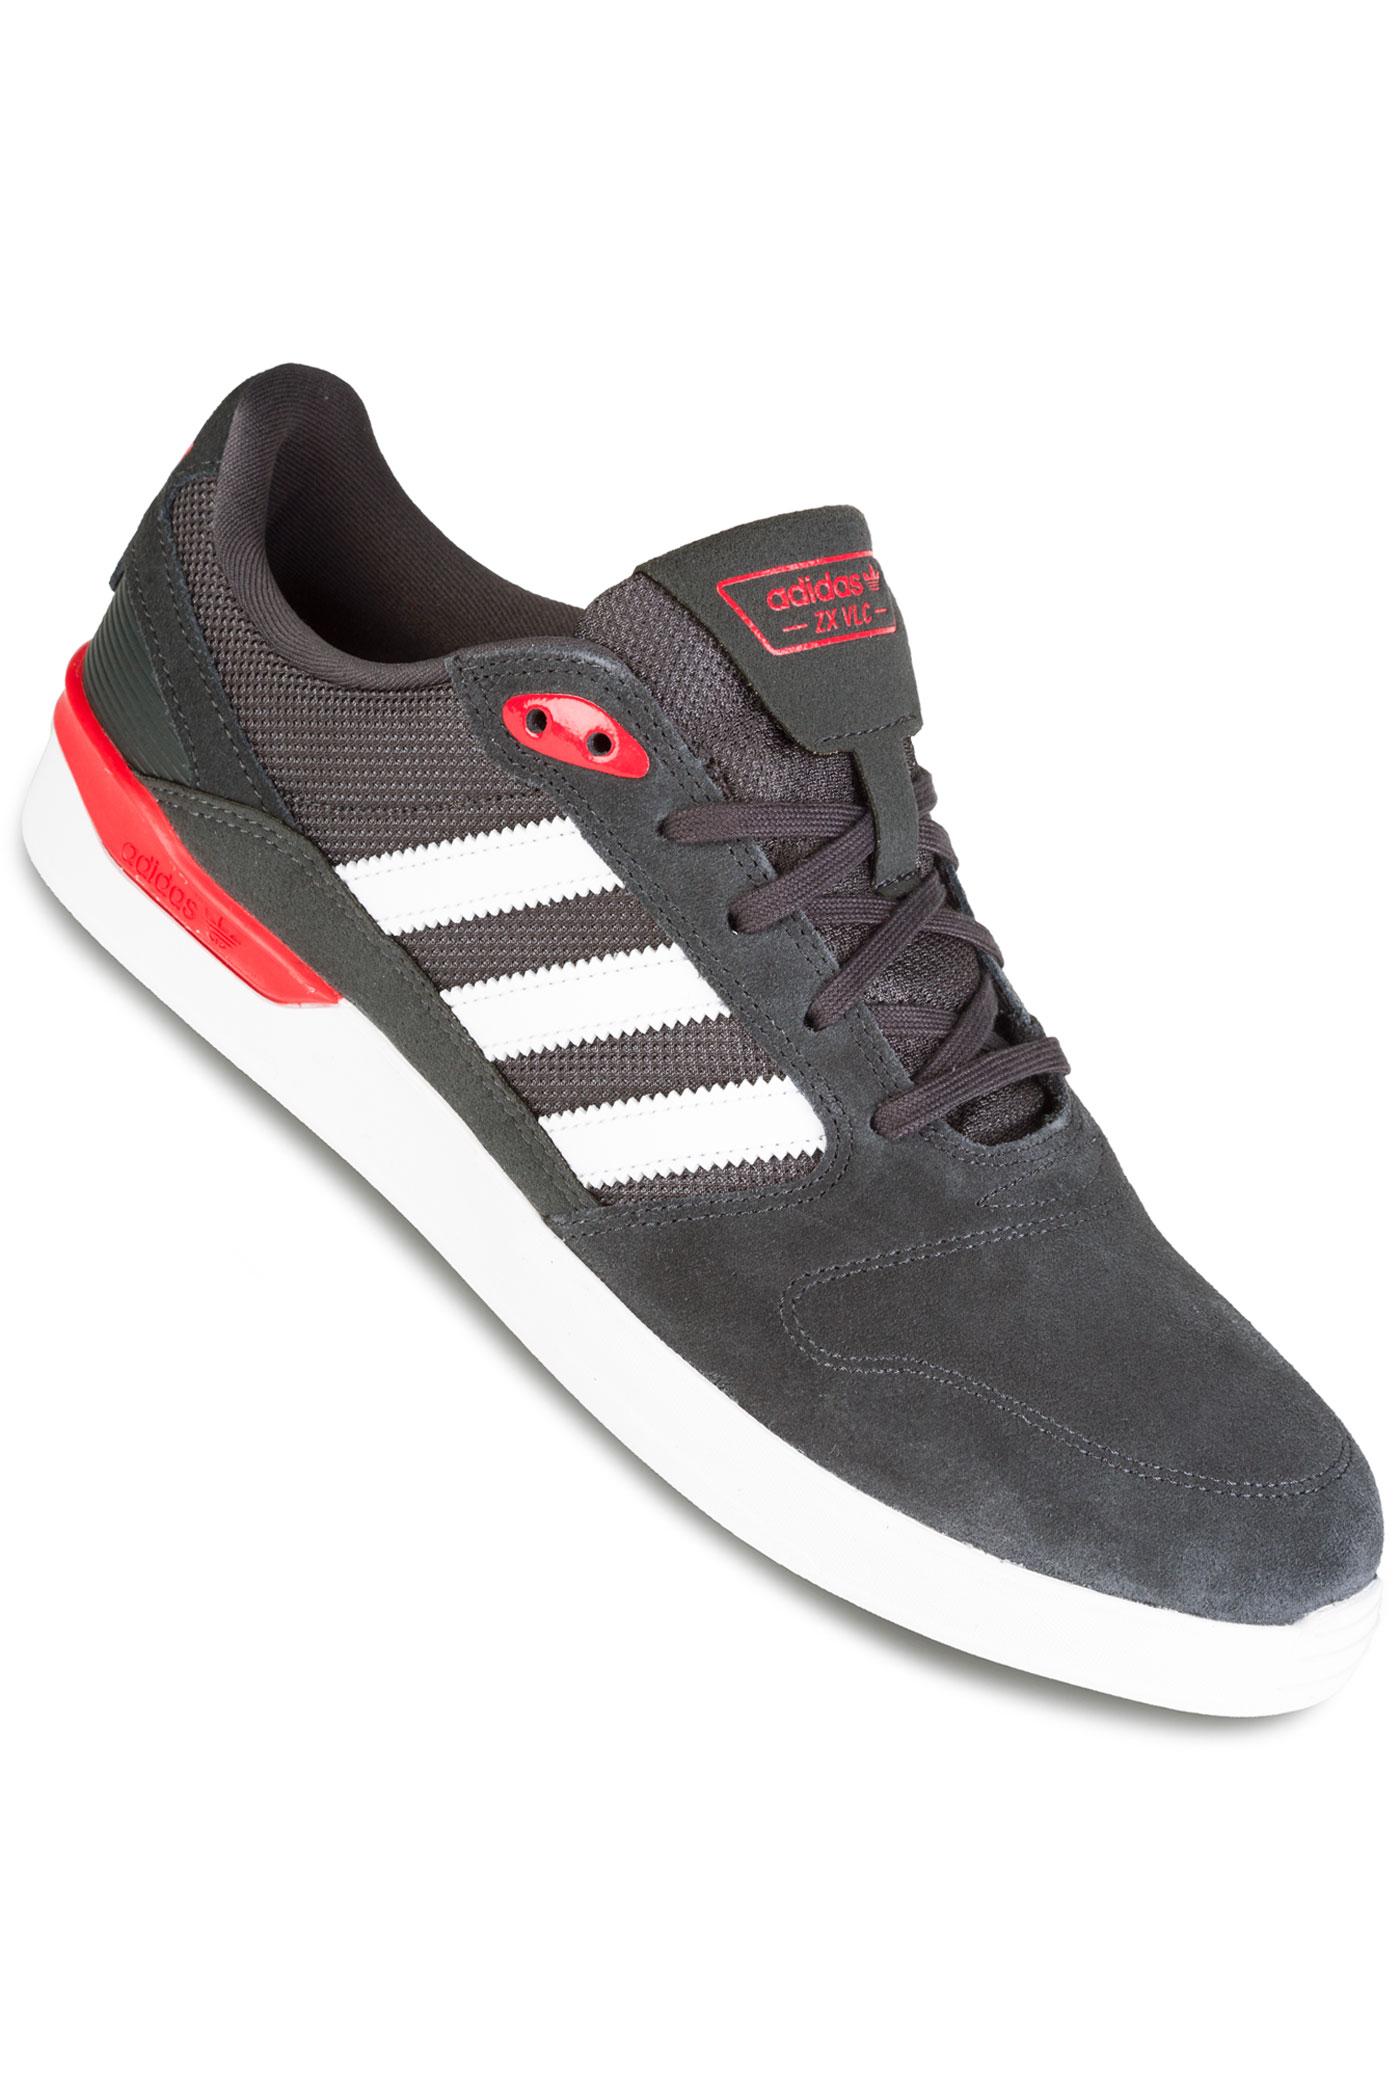 Adidas Zx Vlc